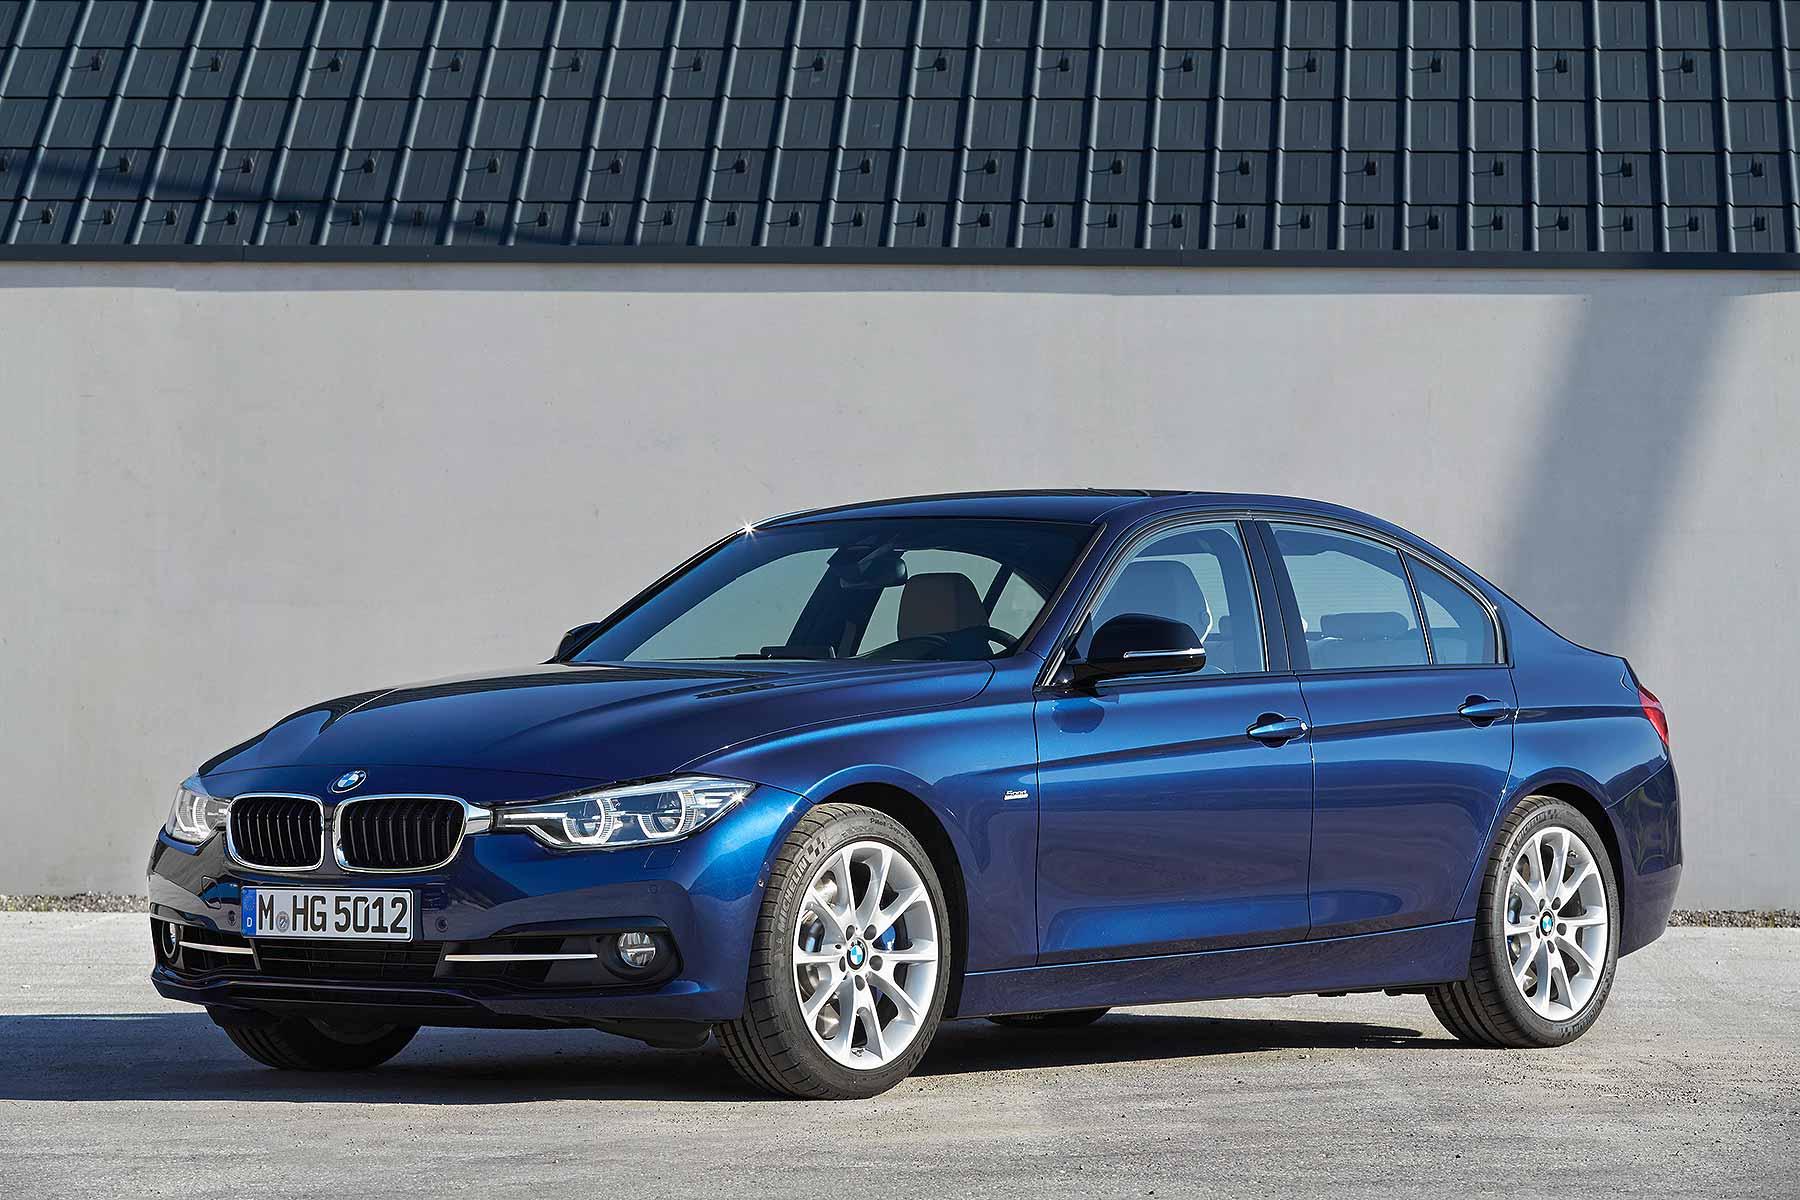 BMW 3 Series LCI 2015